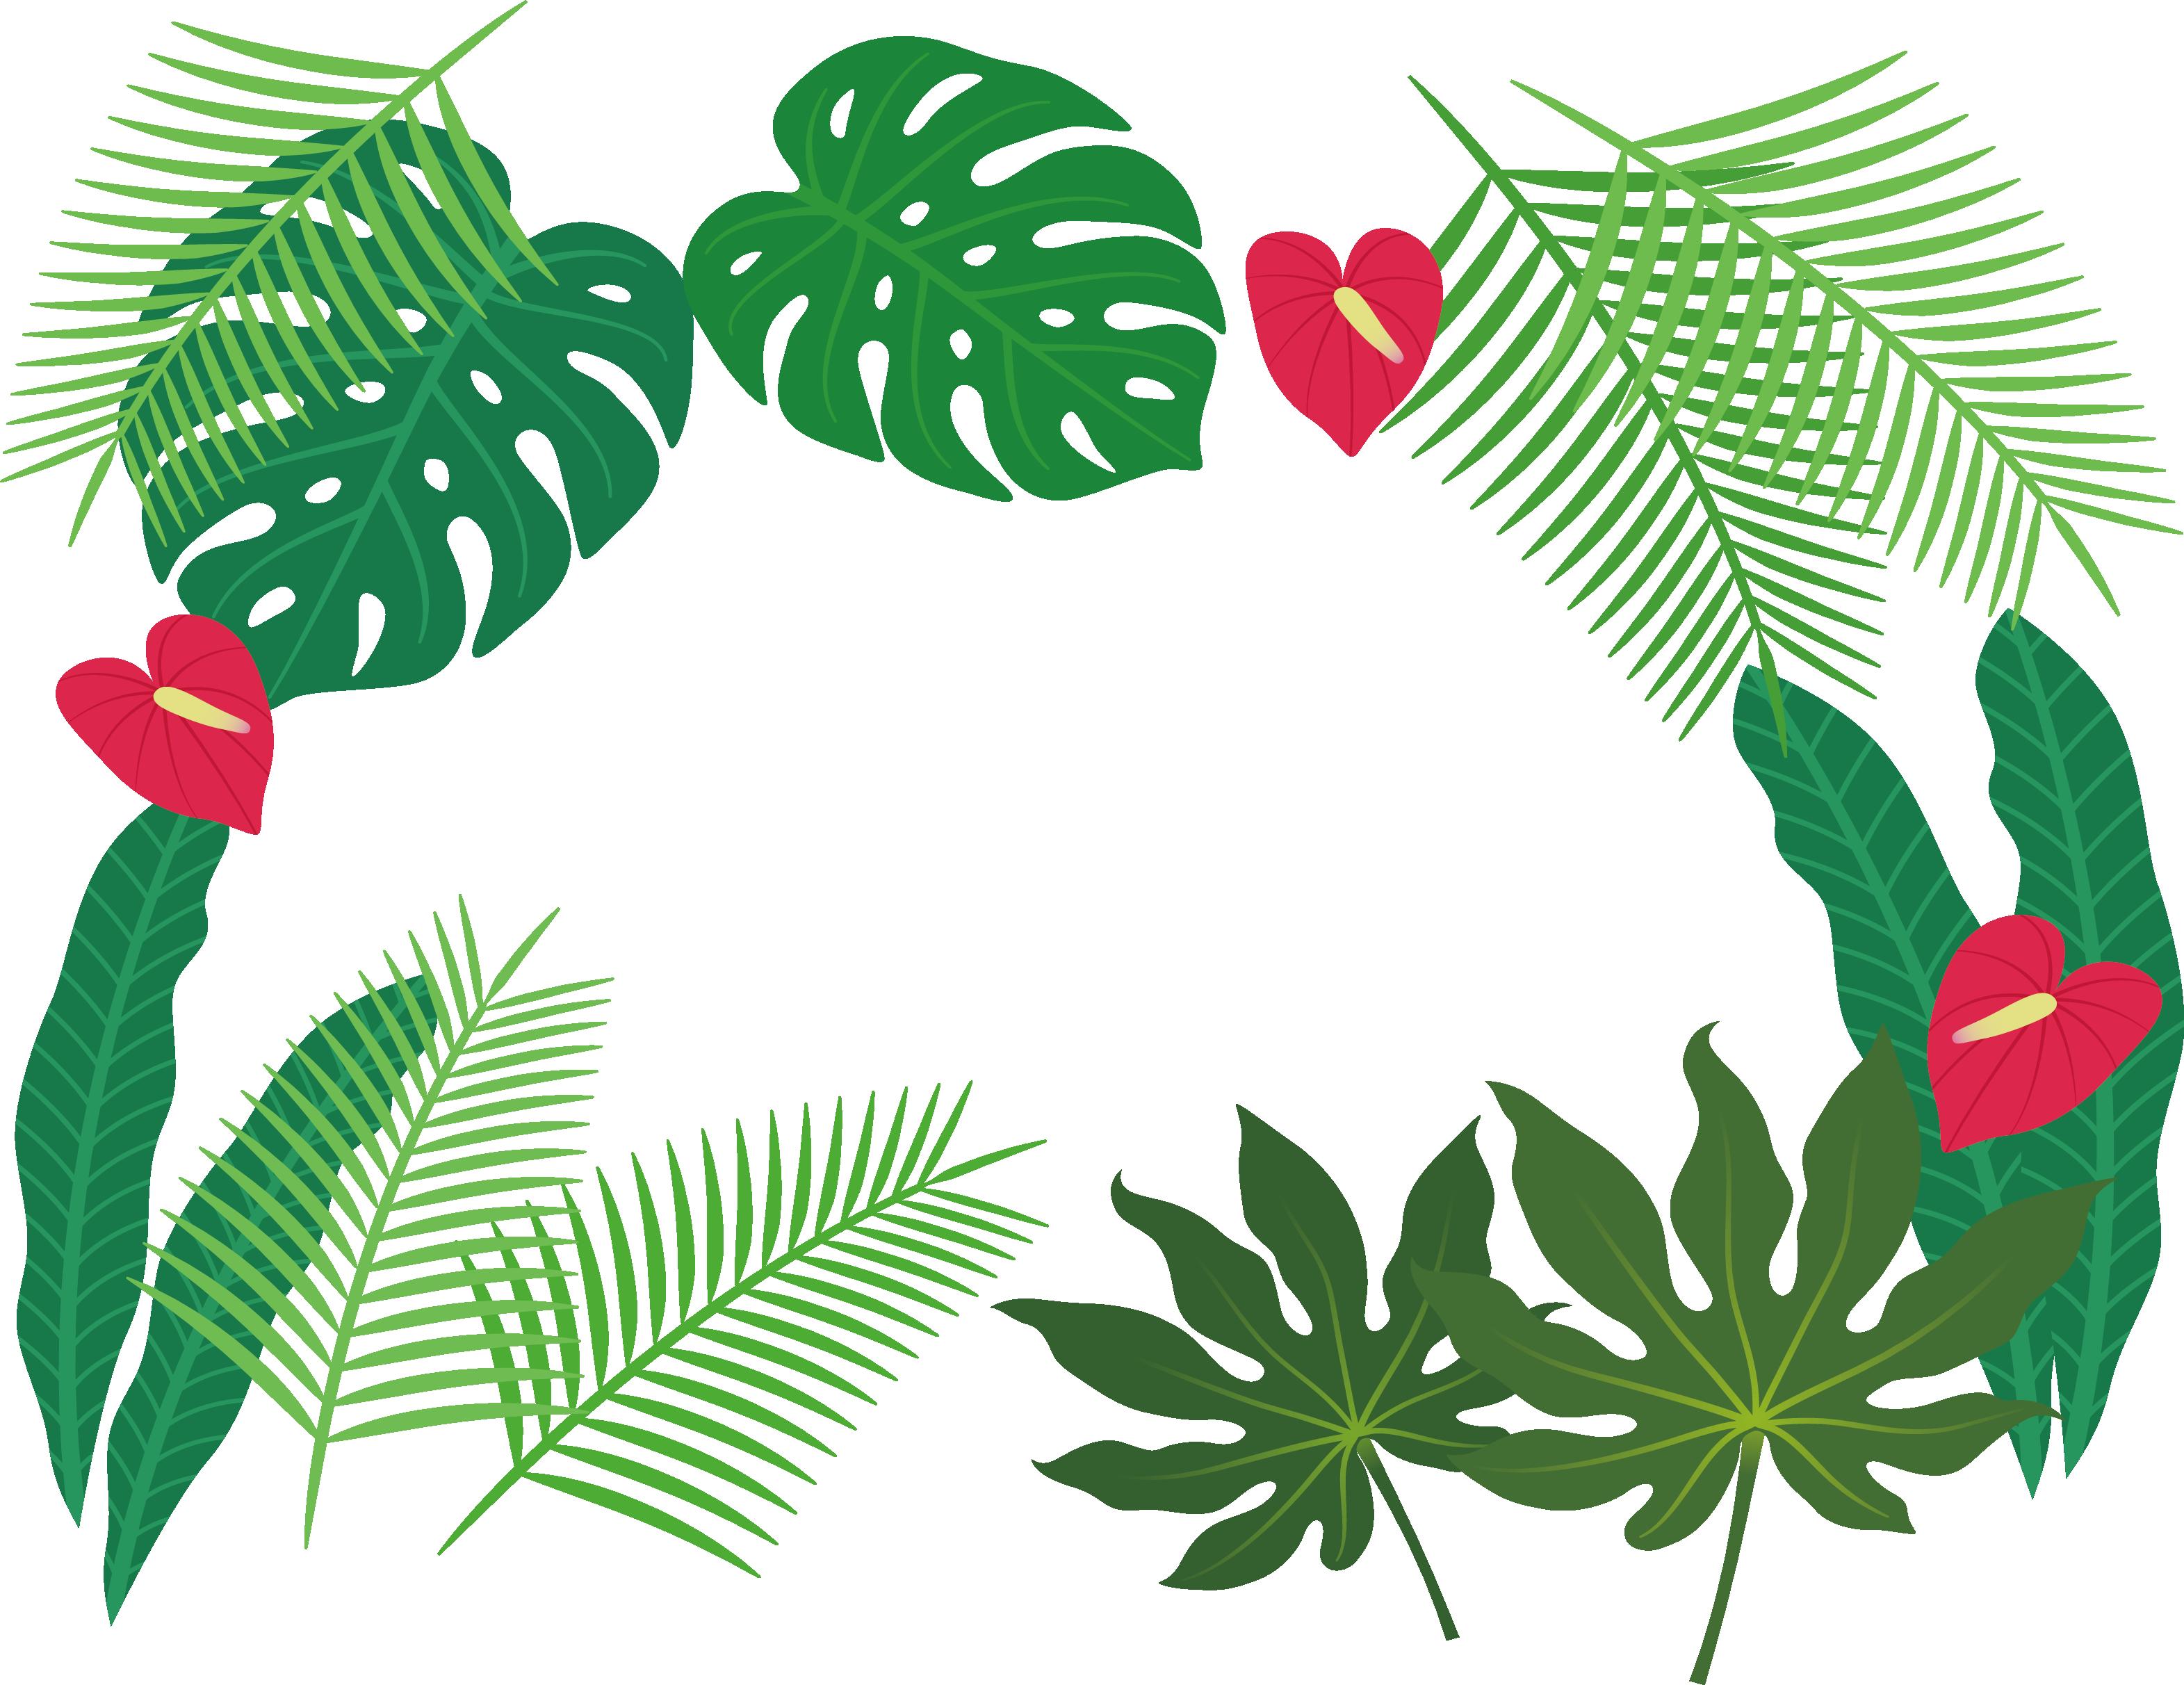 Watermelon clipart tropical. Leaf clip art plant